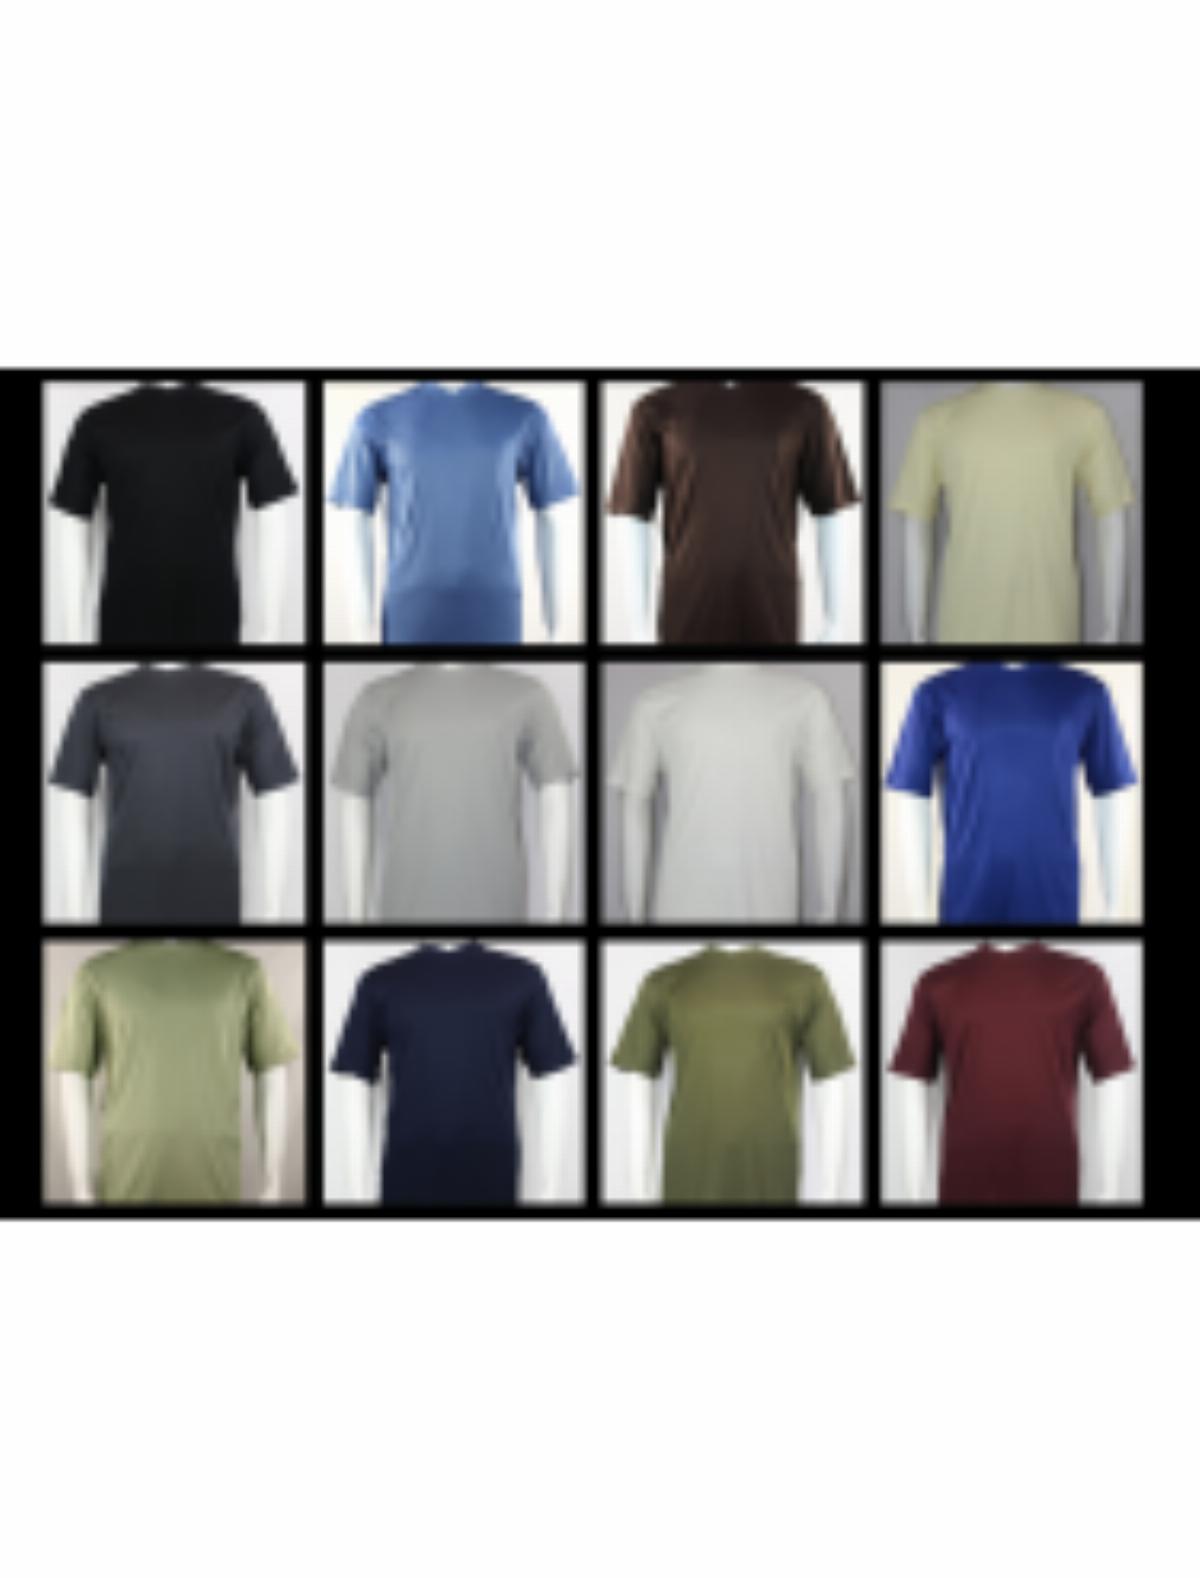 V_Neck_knit_shirts.png